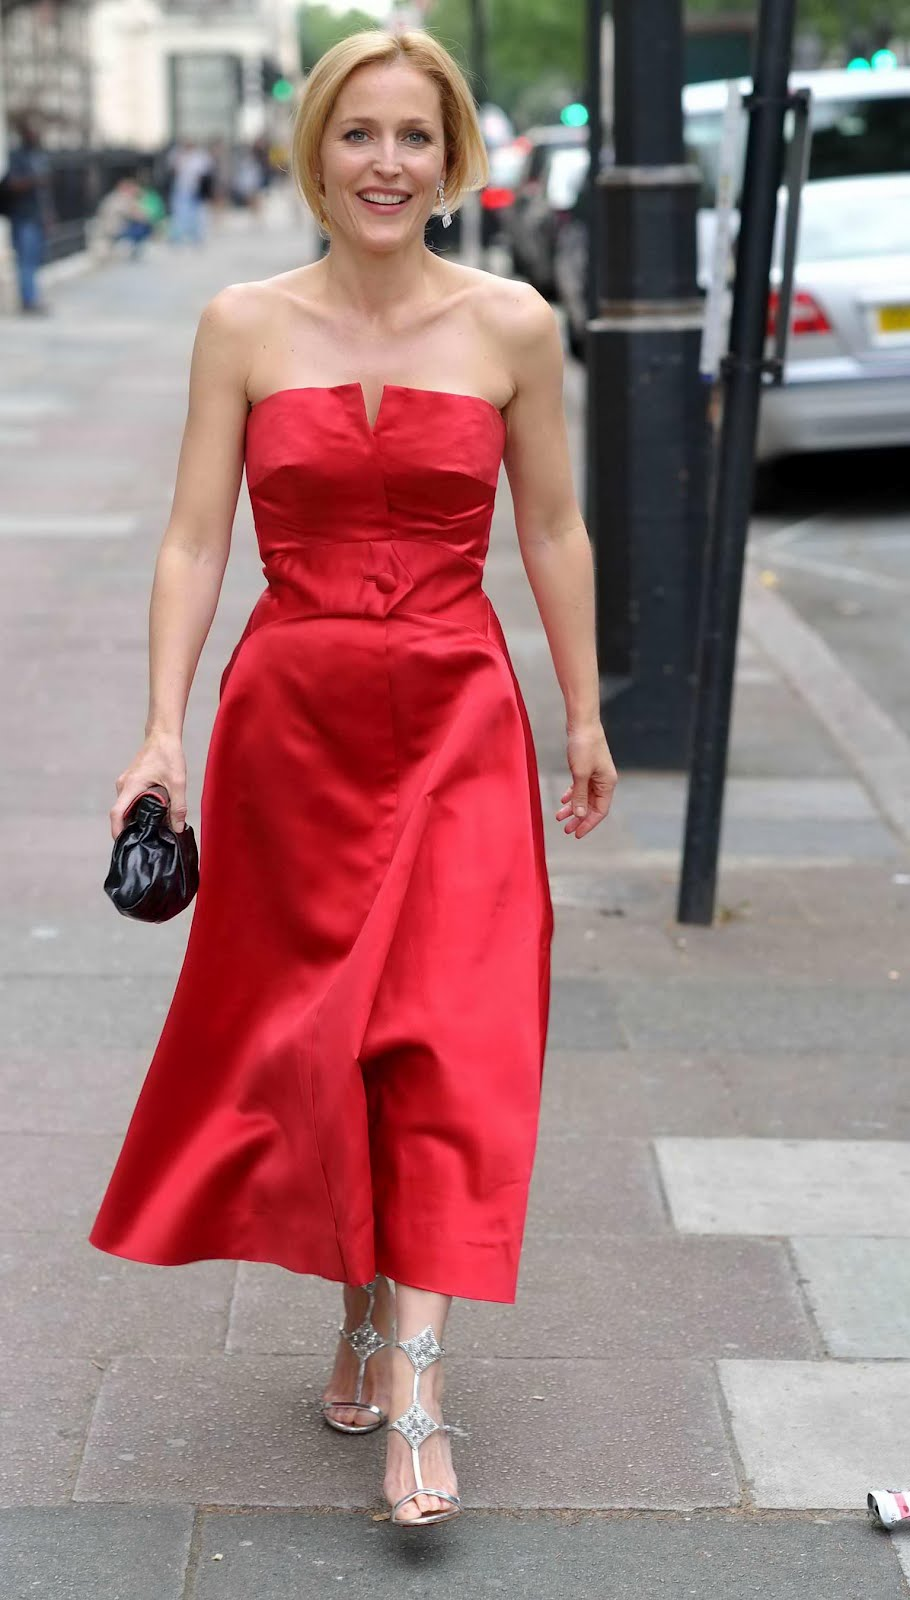 Celebrity Gillian Anderson nudes (45 photo), Hot